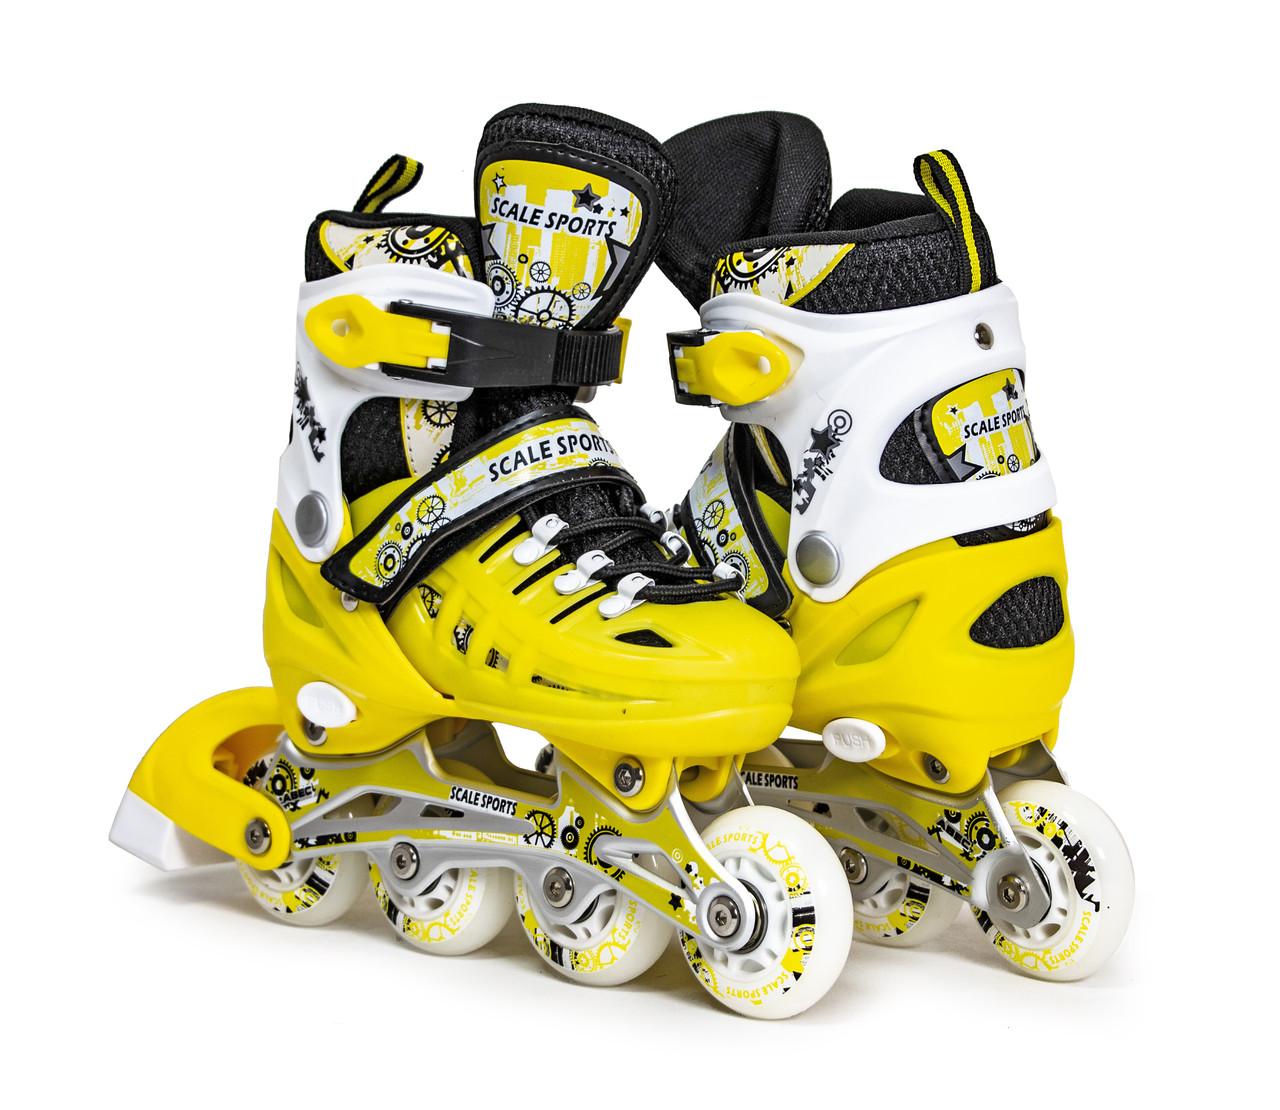 Ролики Scale Sports. Yellow LF 905, розмір 34-37